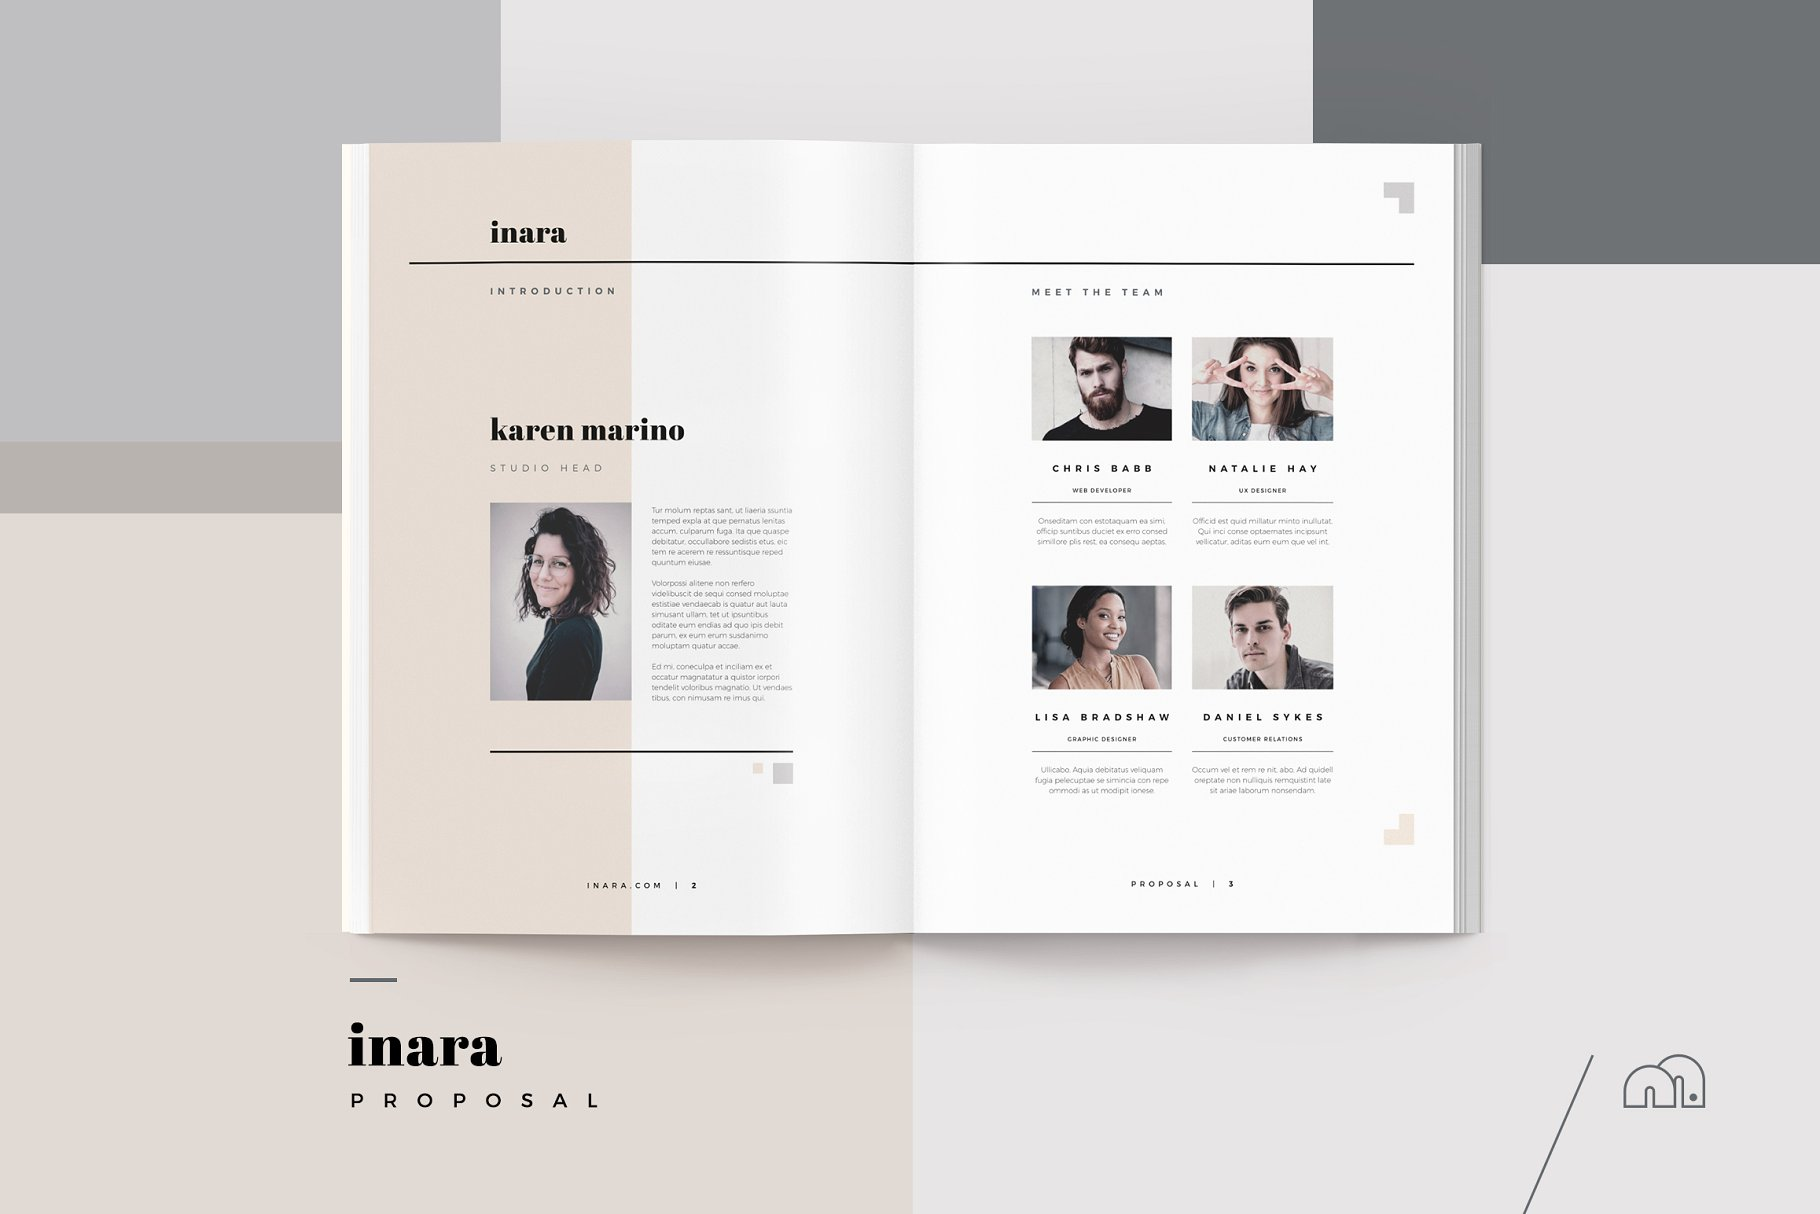 proposal-inara-preview-2-.jpg